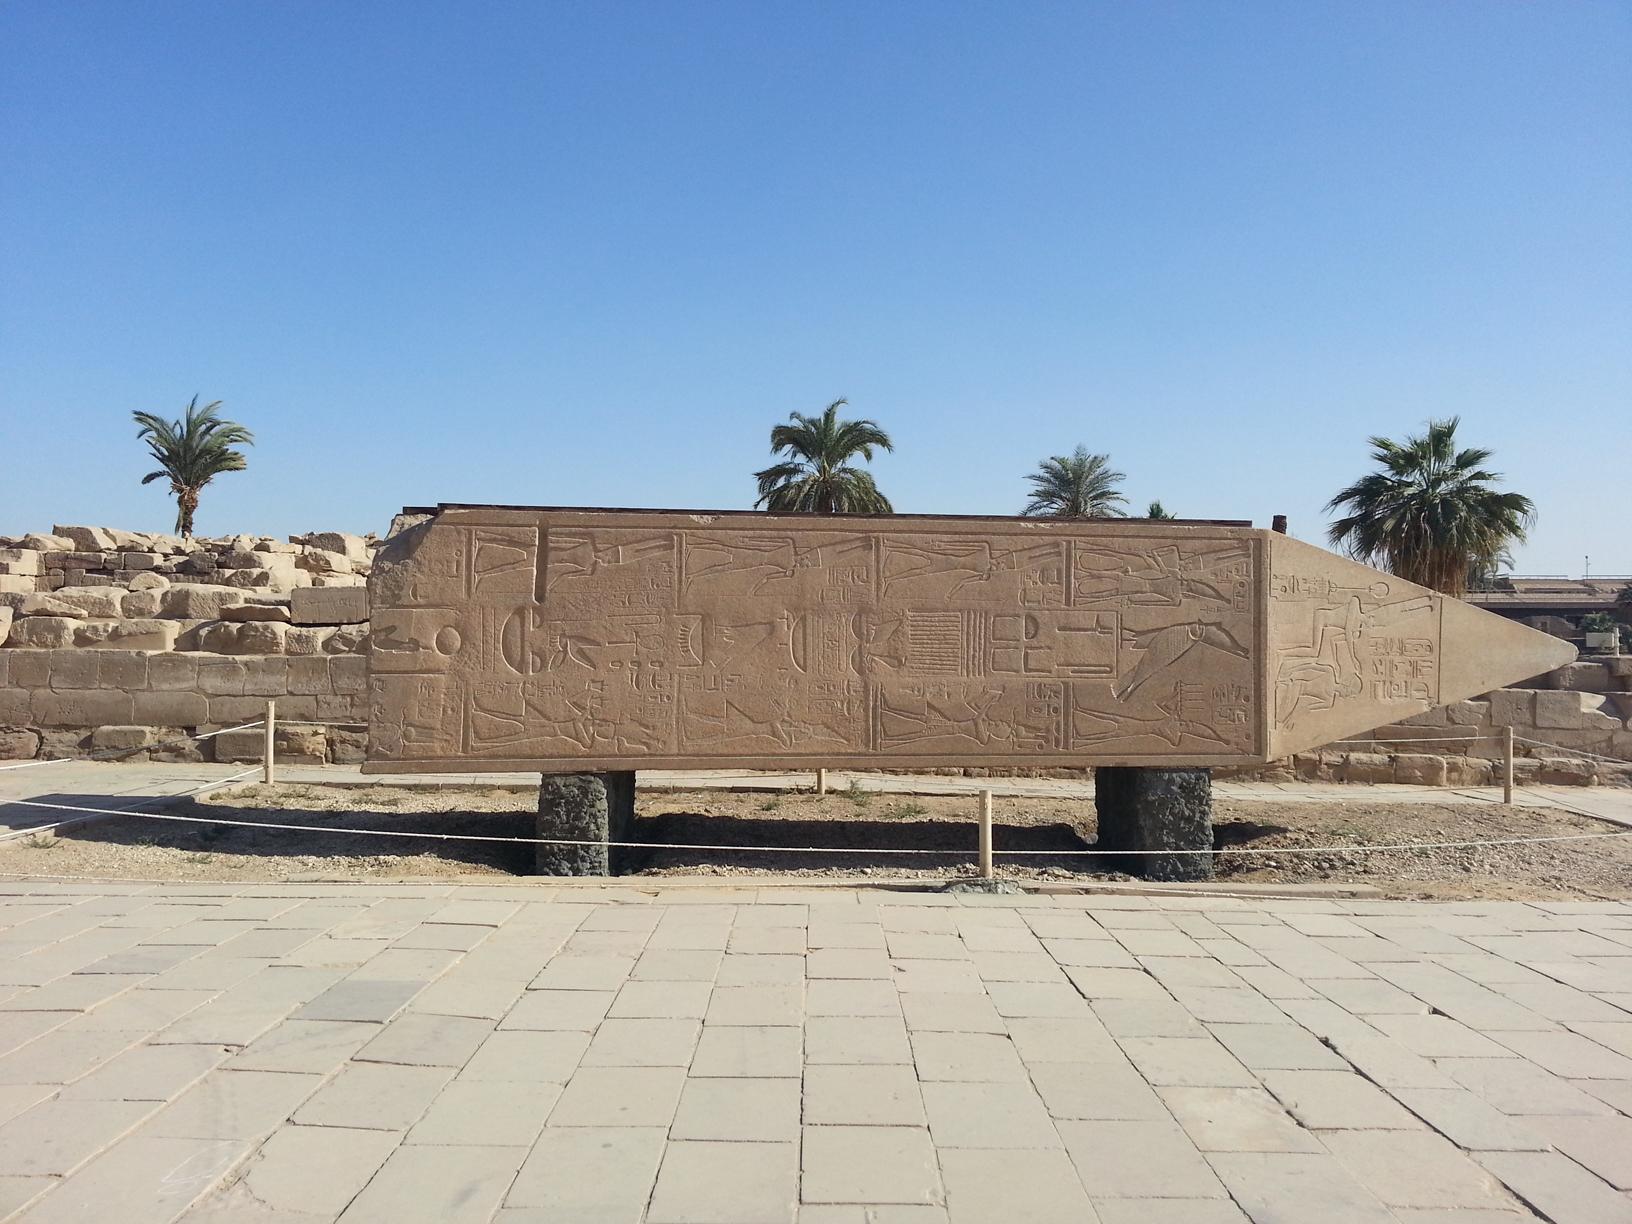 Visit Karnak Temple the broken obelisk during the tour to Luxor from Sharm El Sheikh